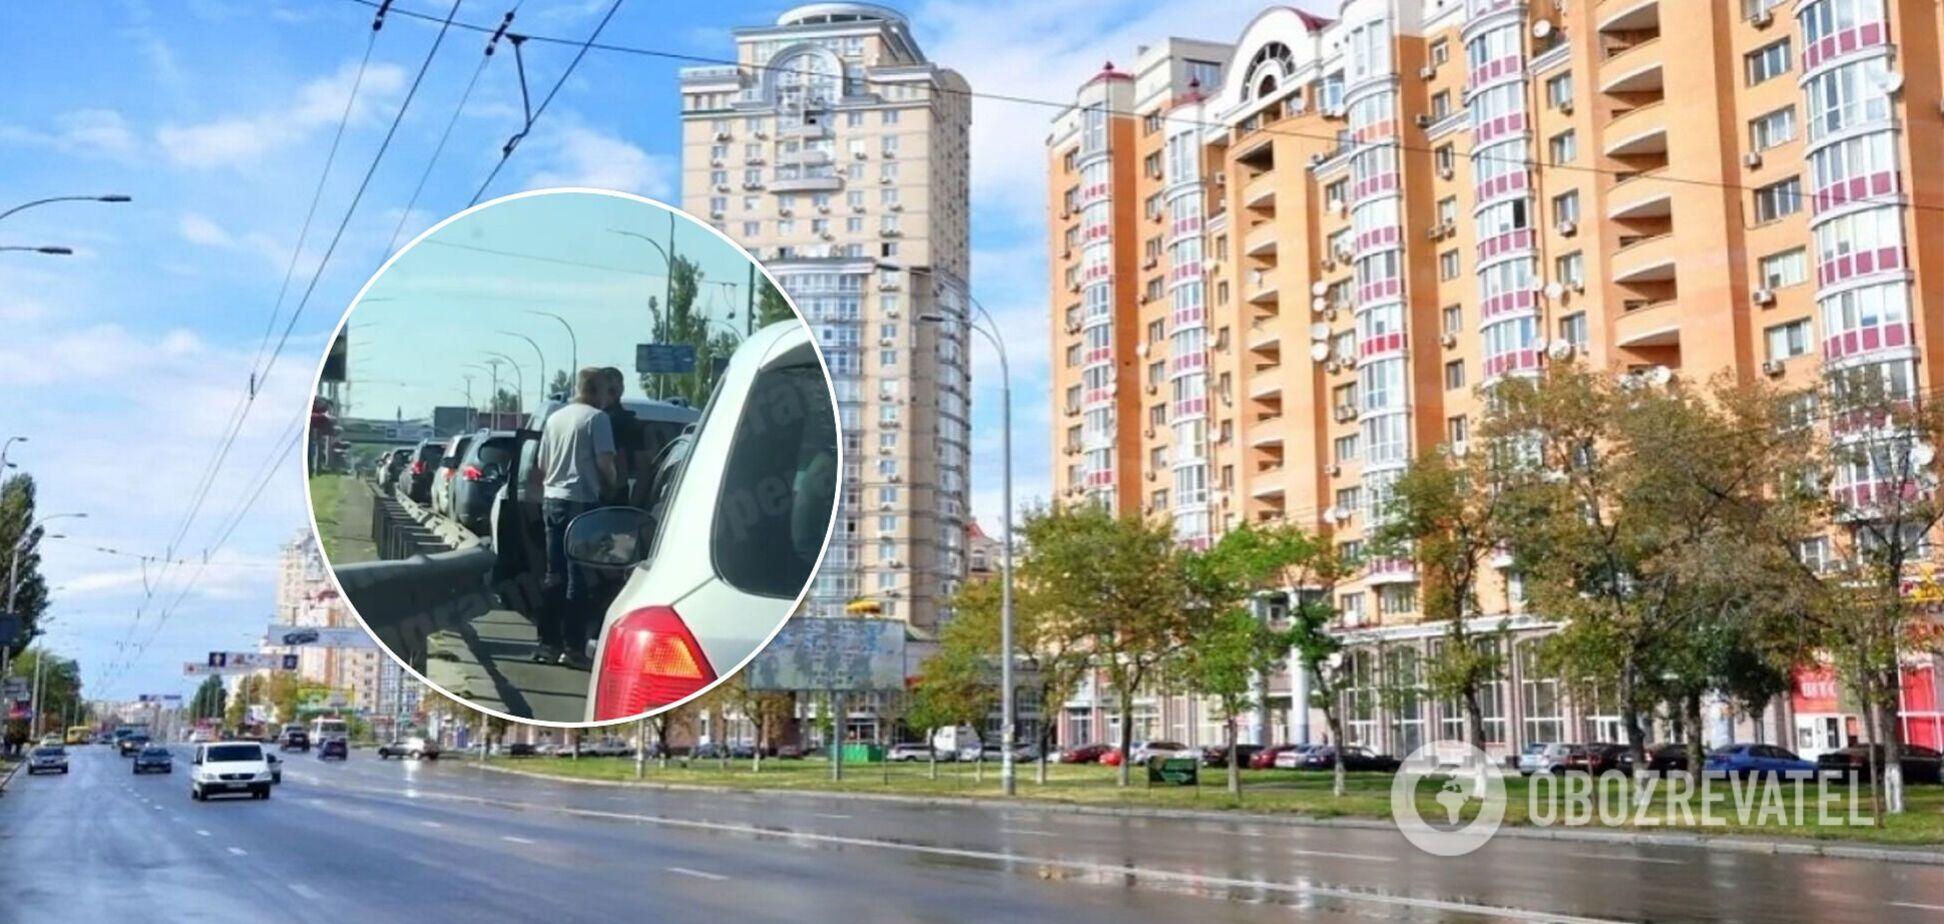 Інцидент стався на проспекті Героїв Сталінграда